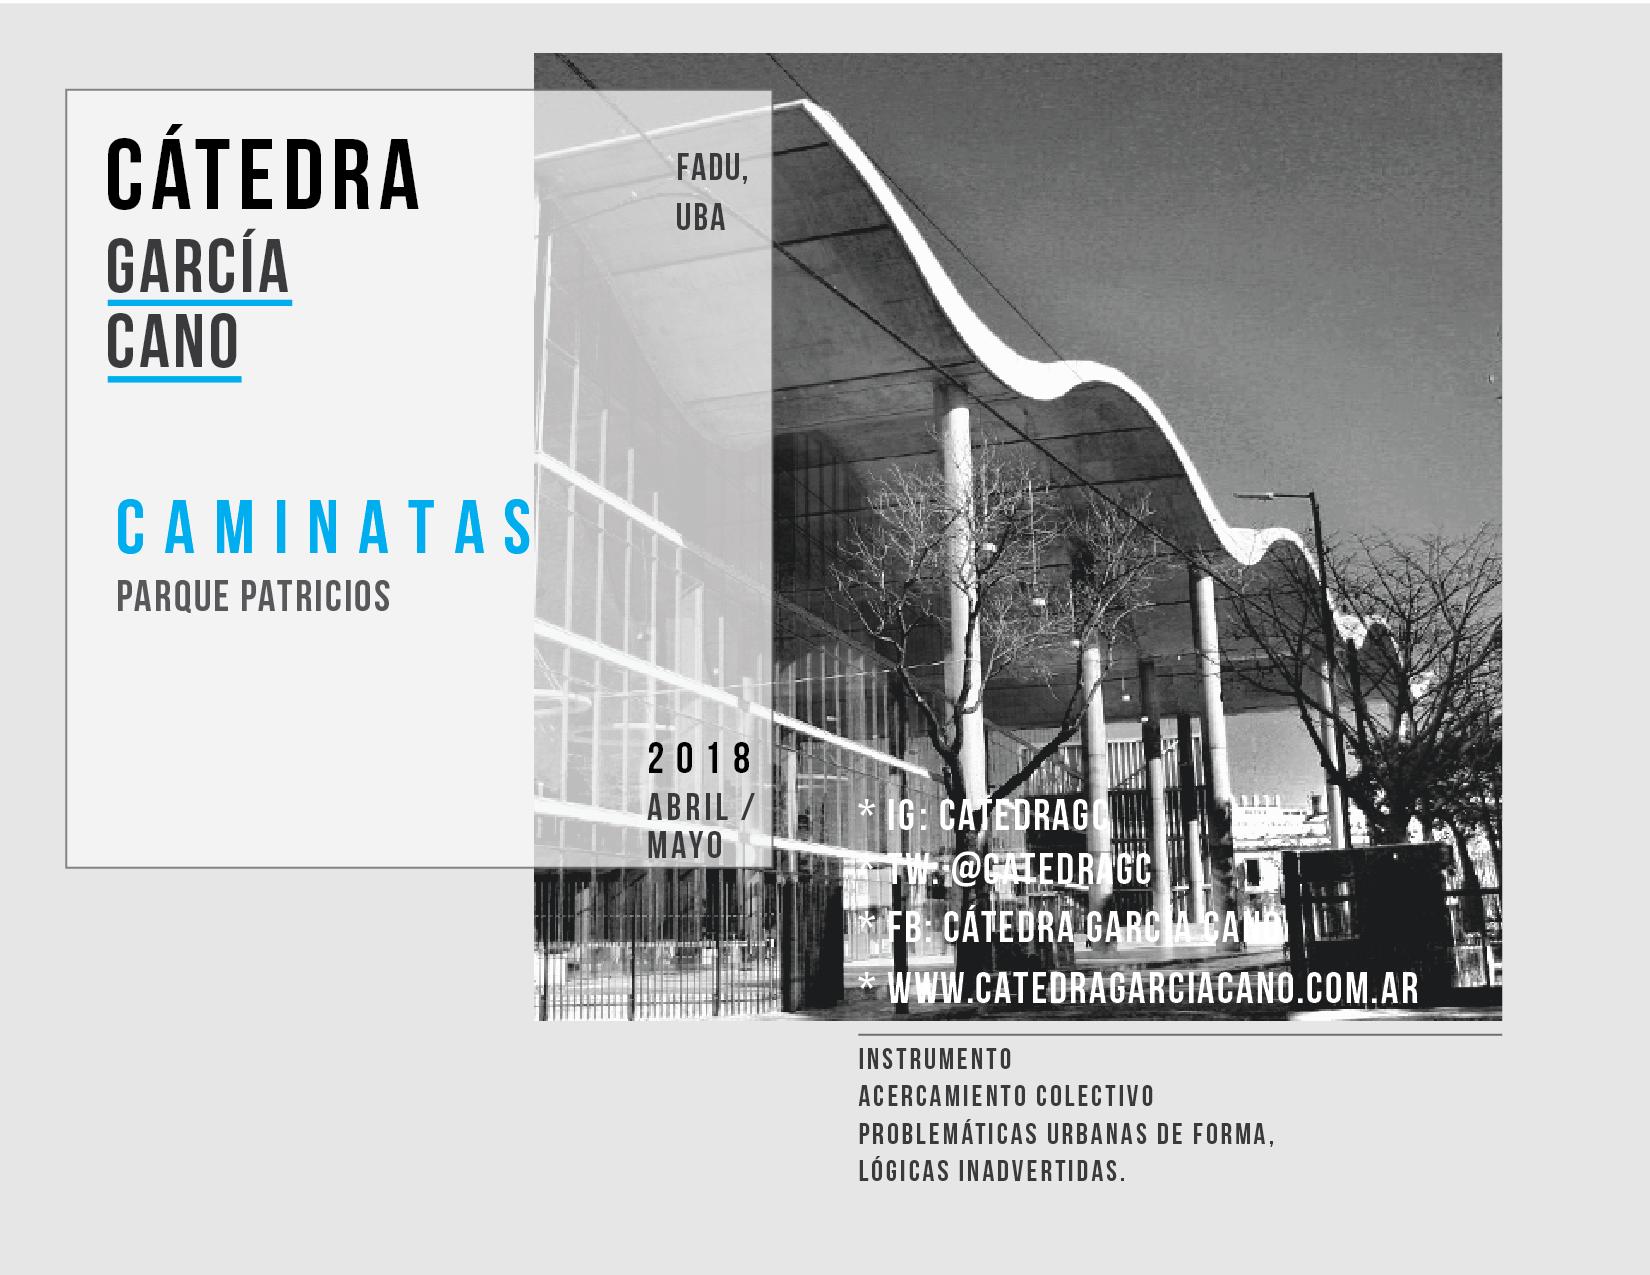 afiche-catedra-18_caminata-parque-patricios-01-04-04